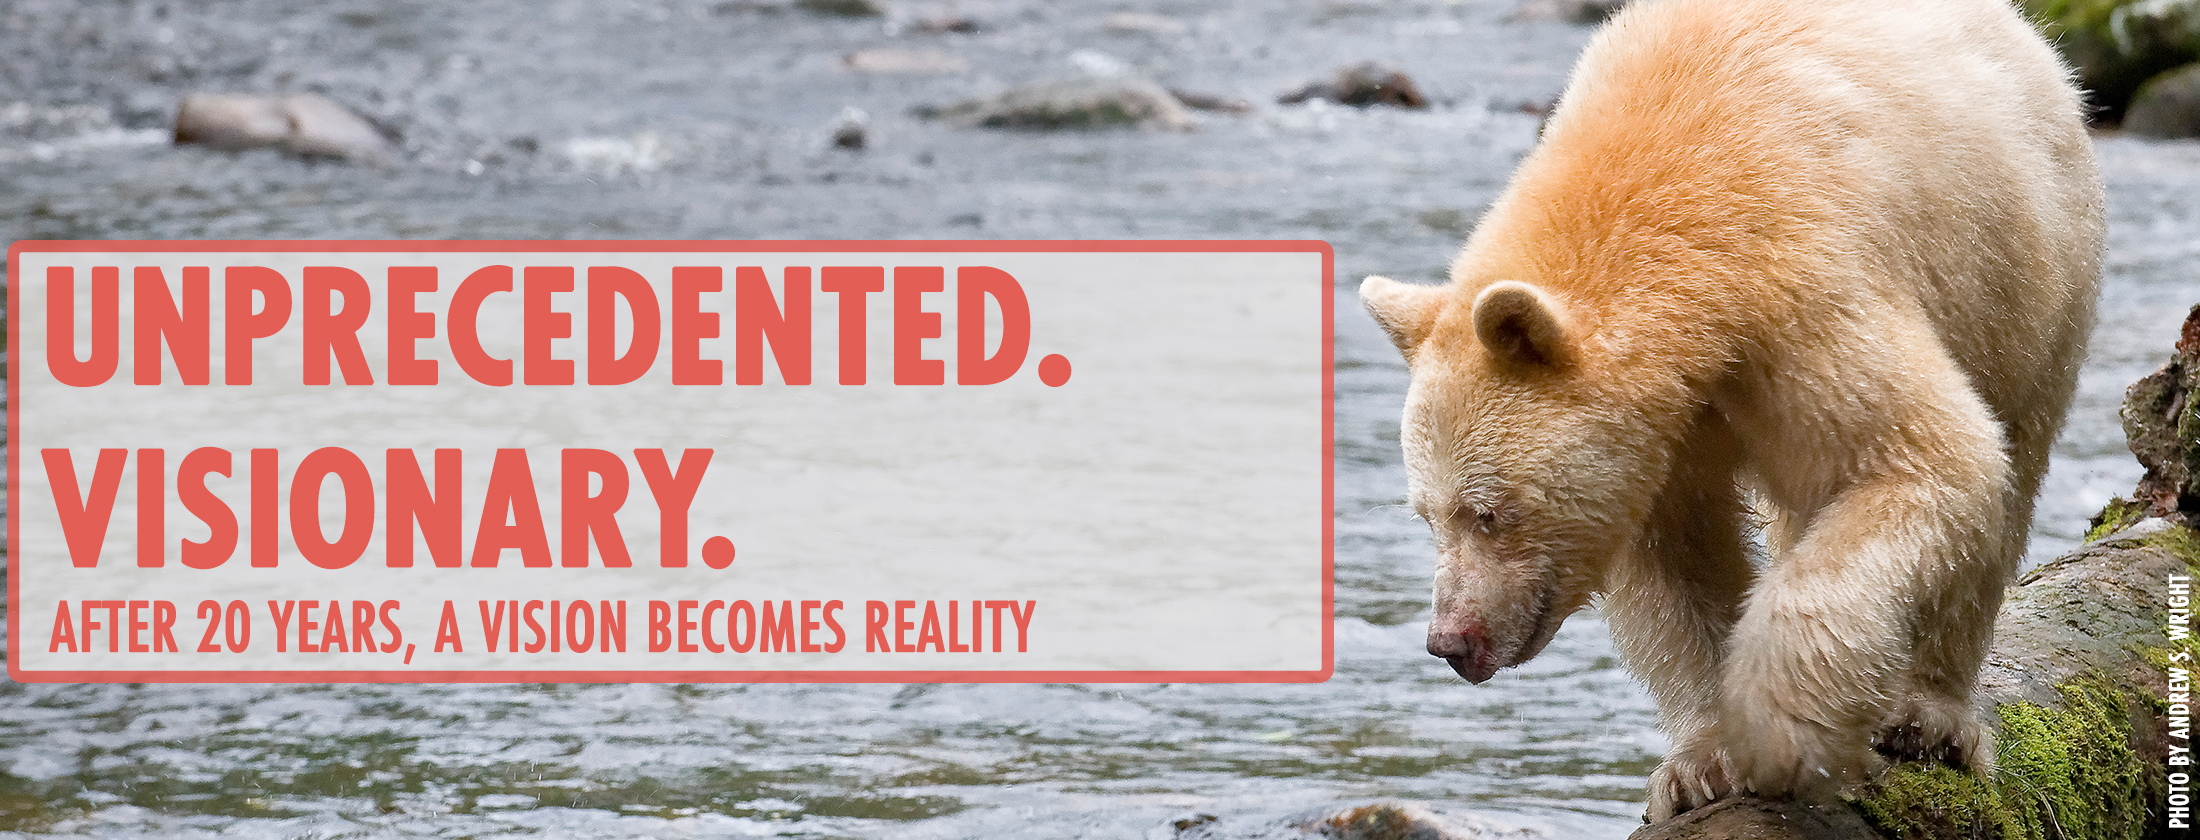 Unprecedented.Visionary.Great Bear Rainforest